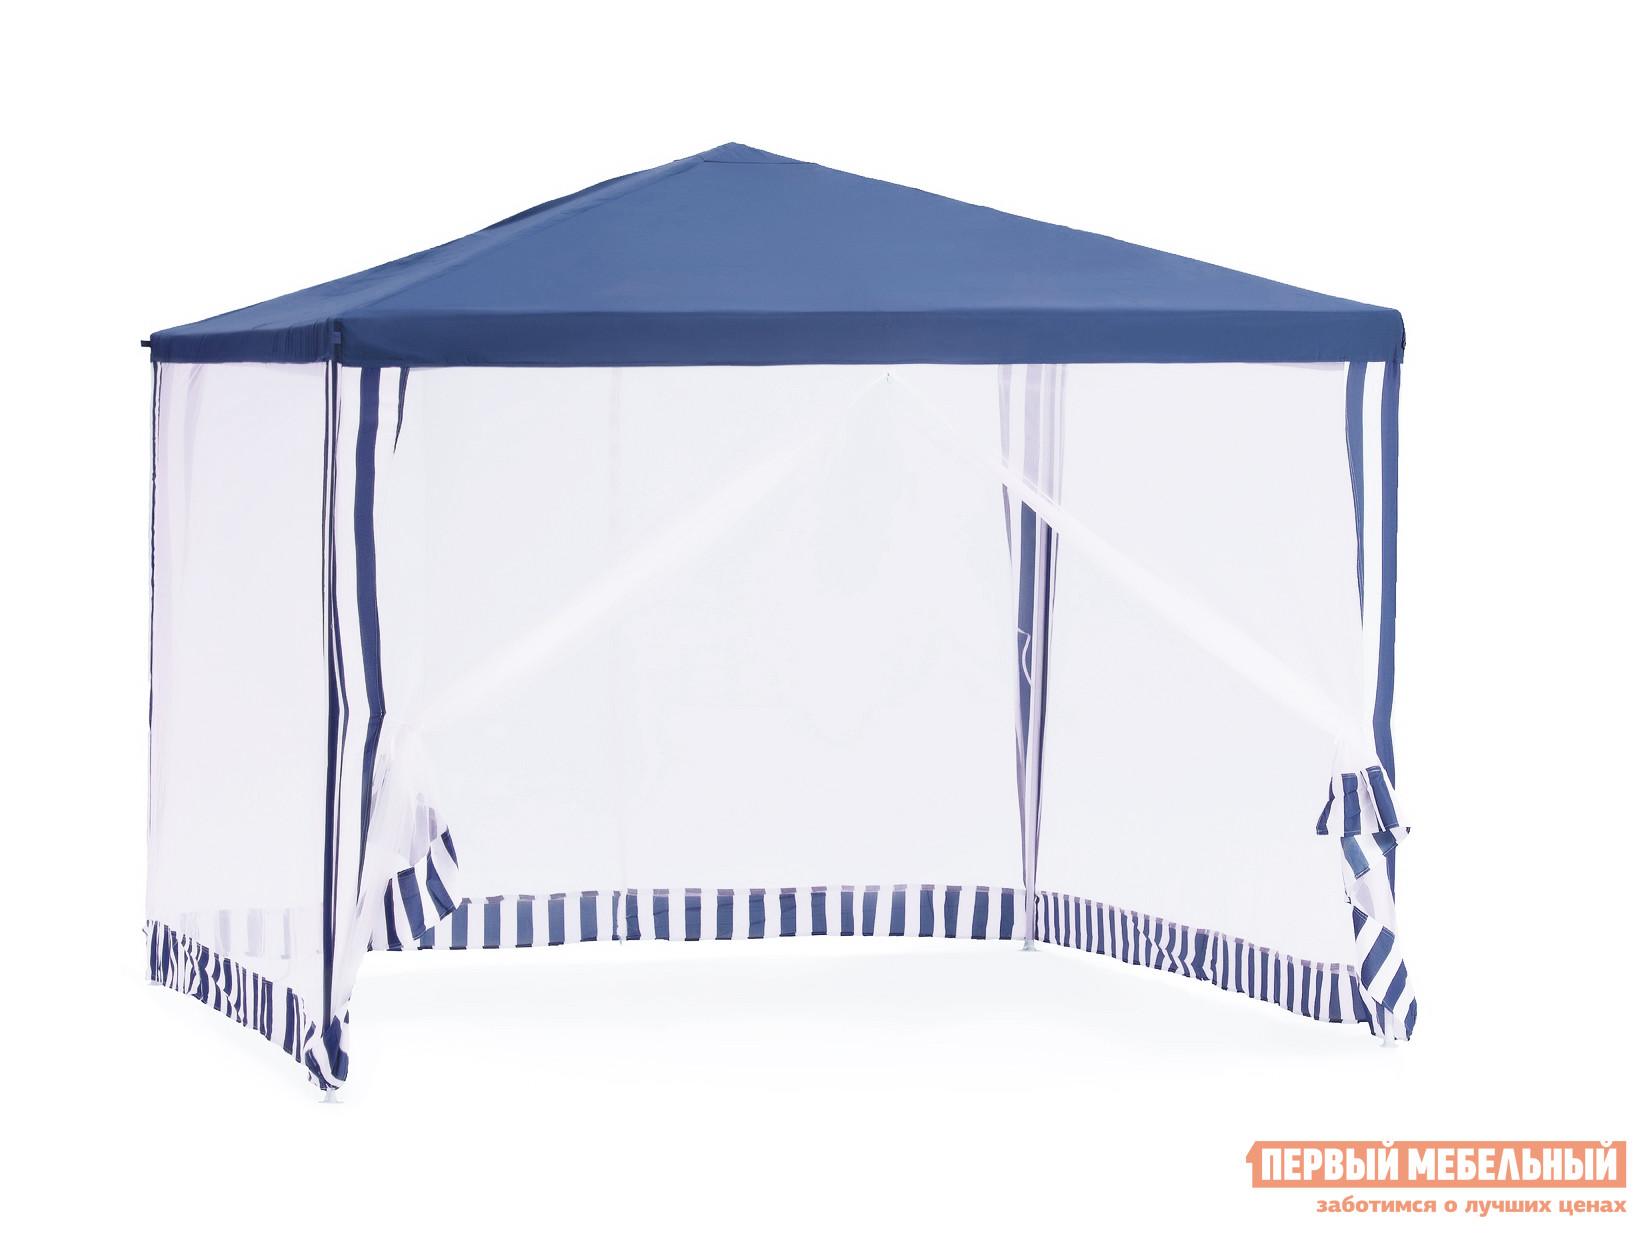 Быстросборный шатер на металлическом каркасе Лекс групп Green Glade 1086